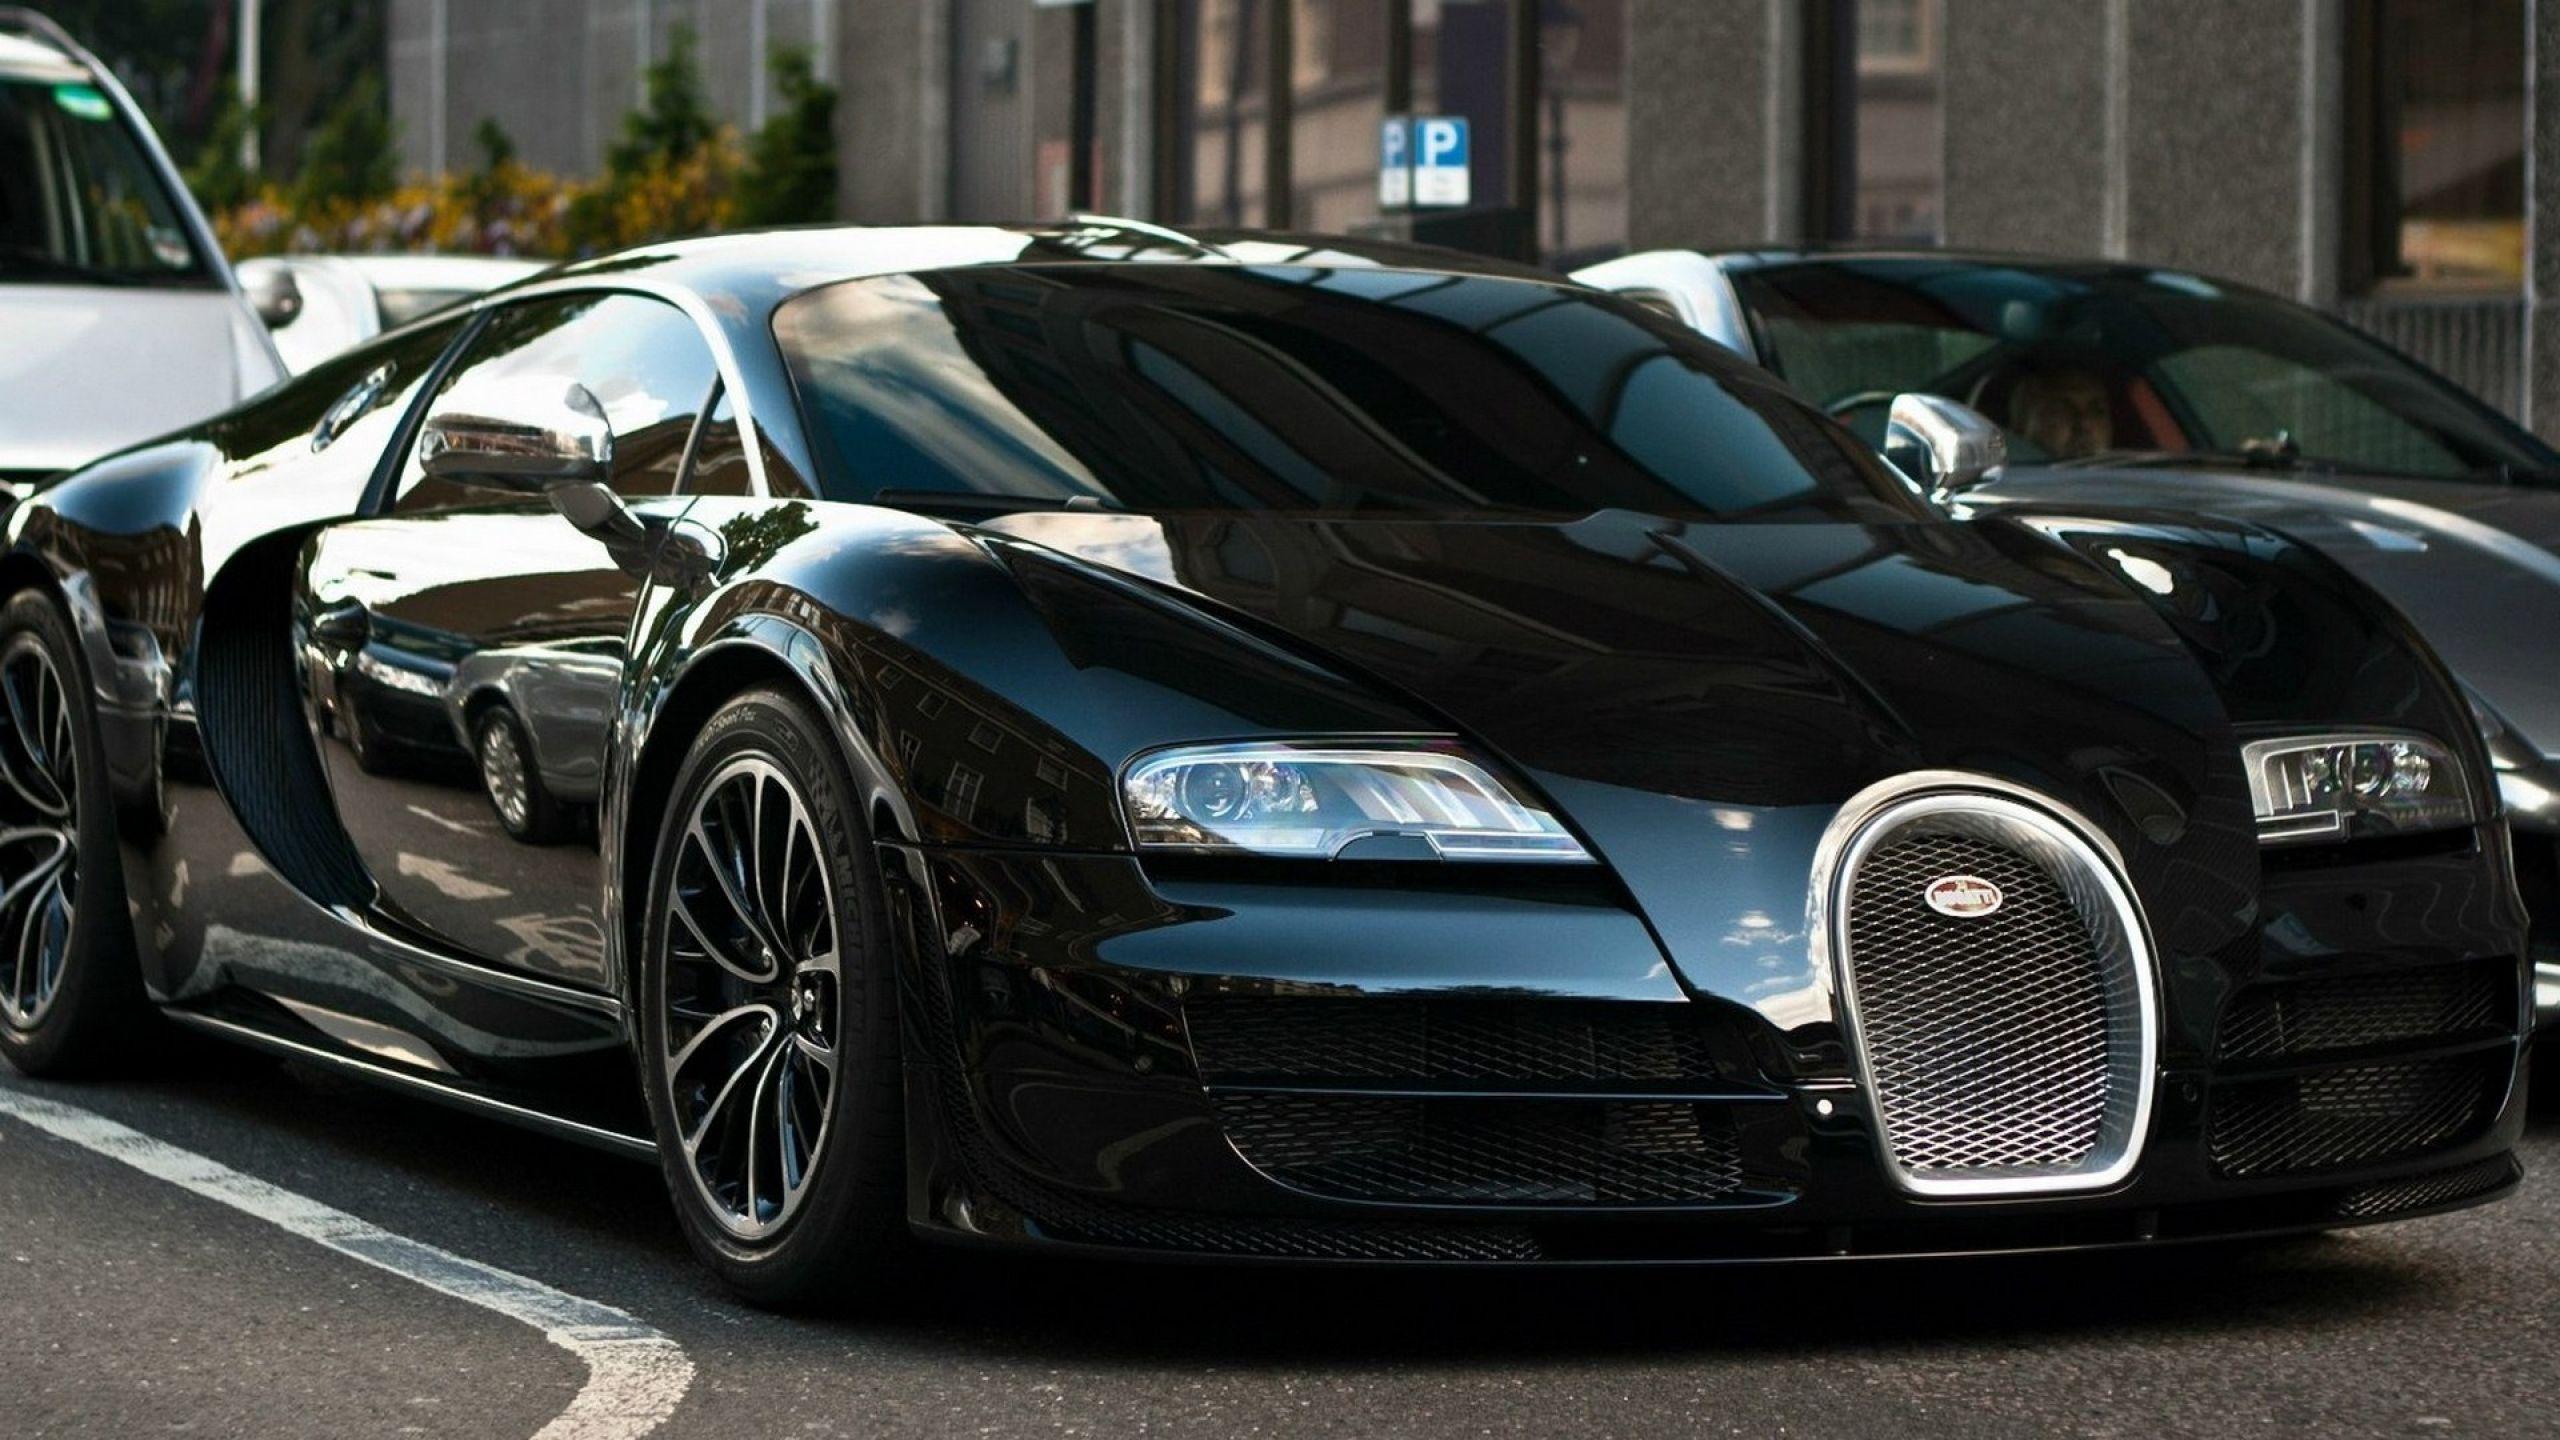 57 Best Free Gold Bugatti Veyron Car Wallpapers Wallpaperaccess